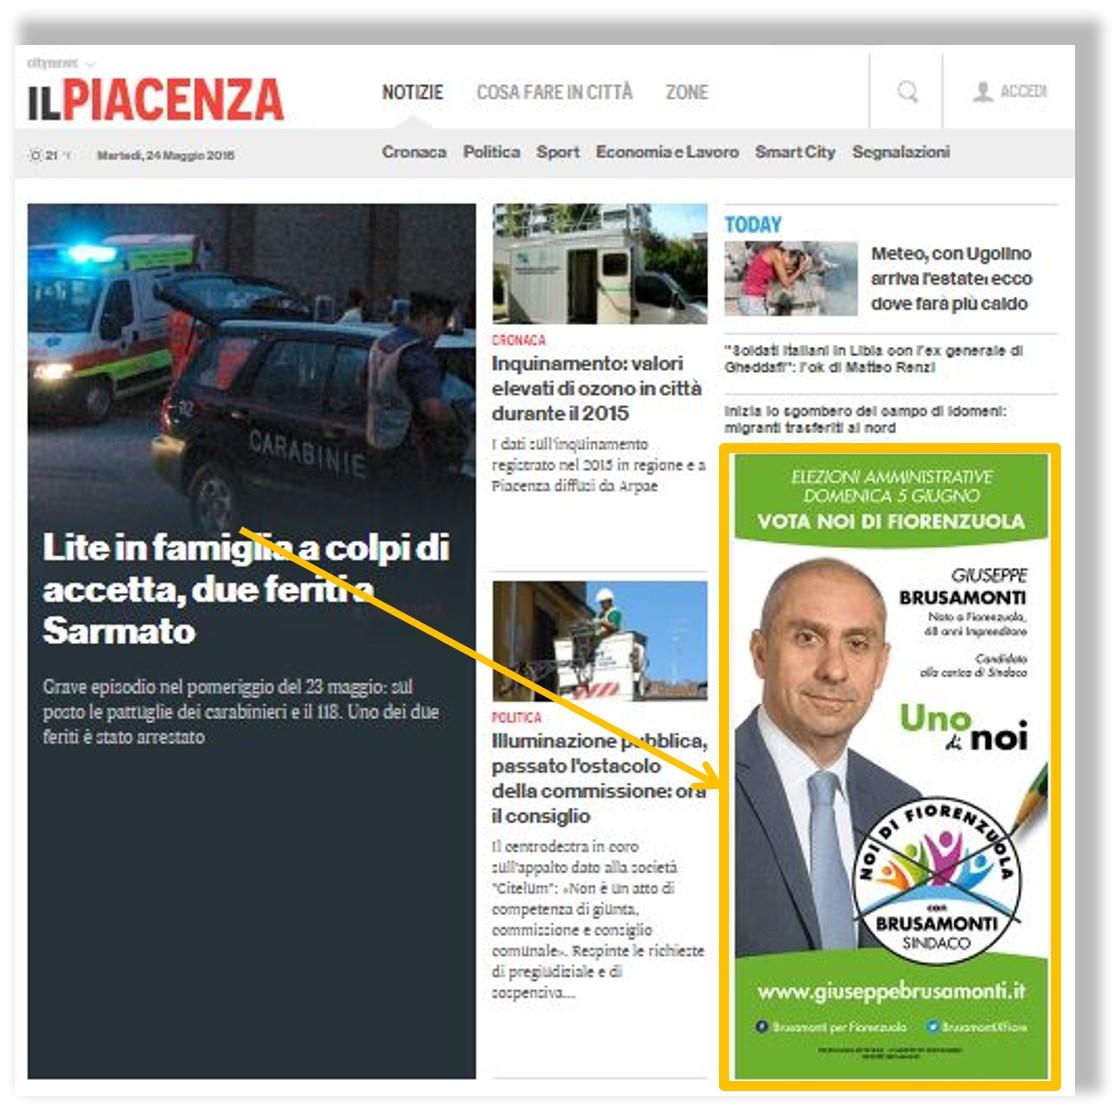 fiorenzuola_desk